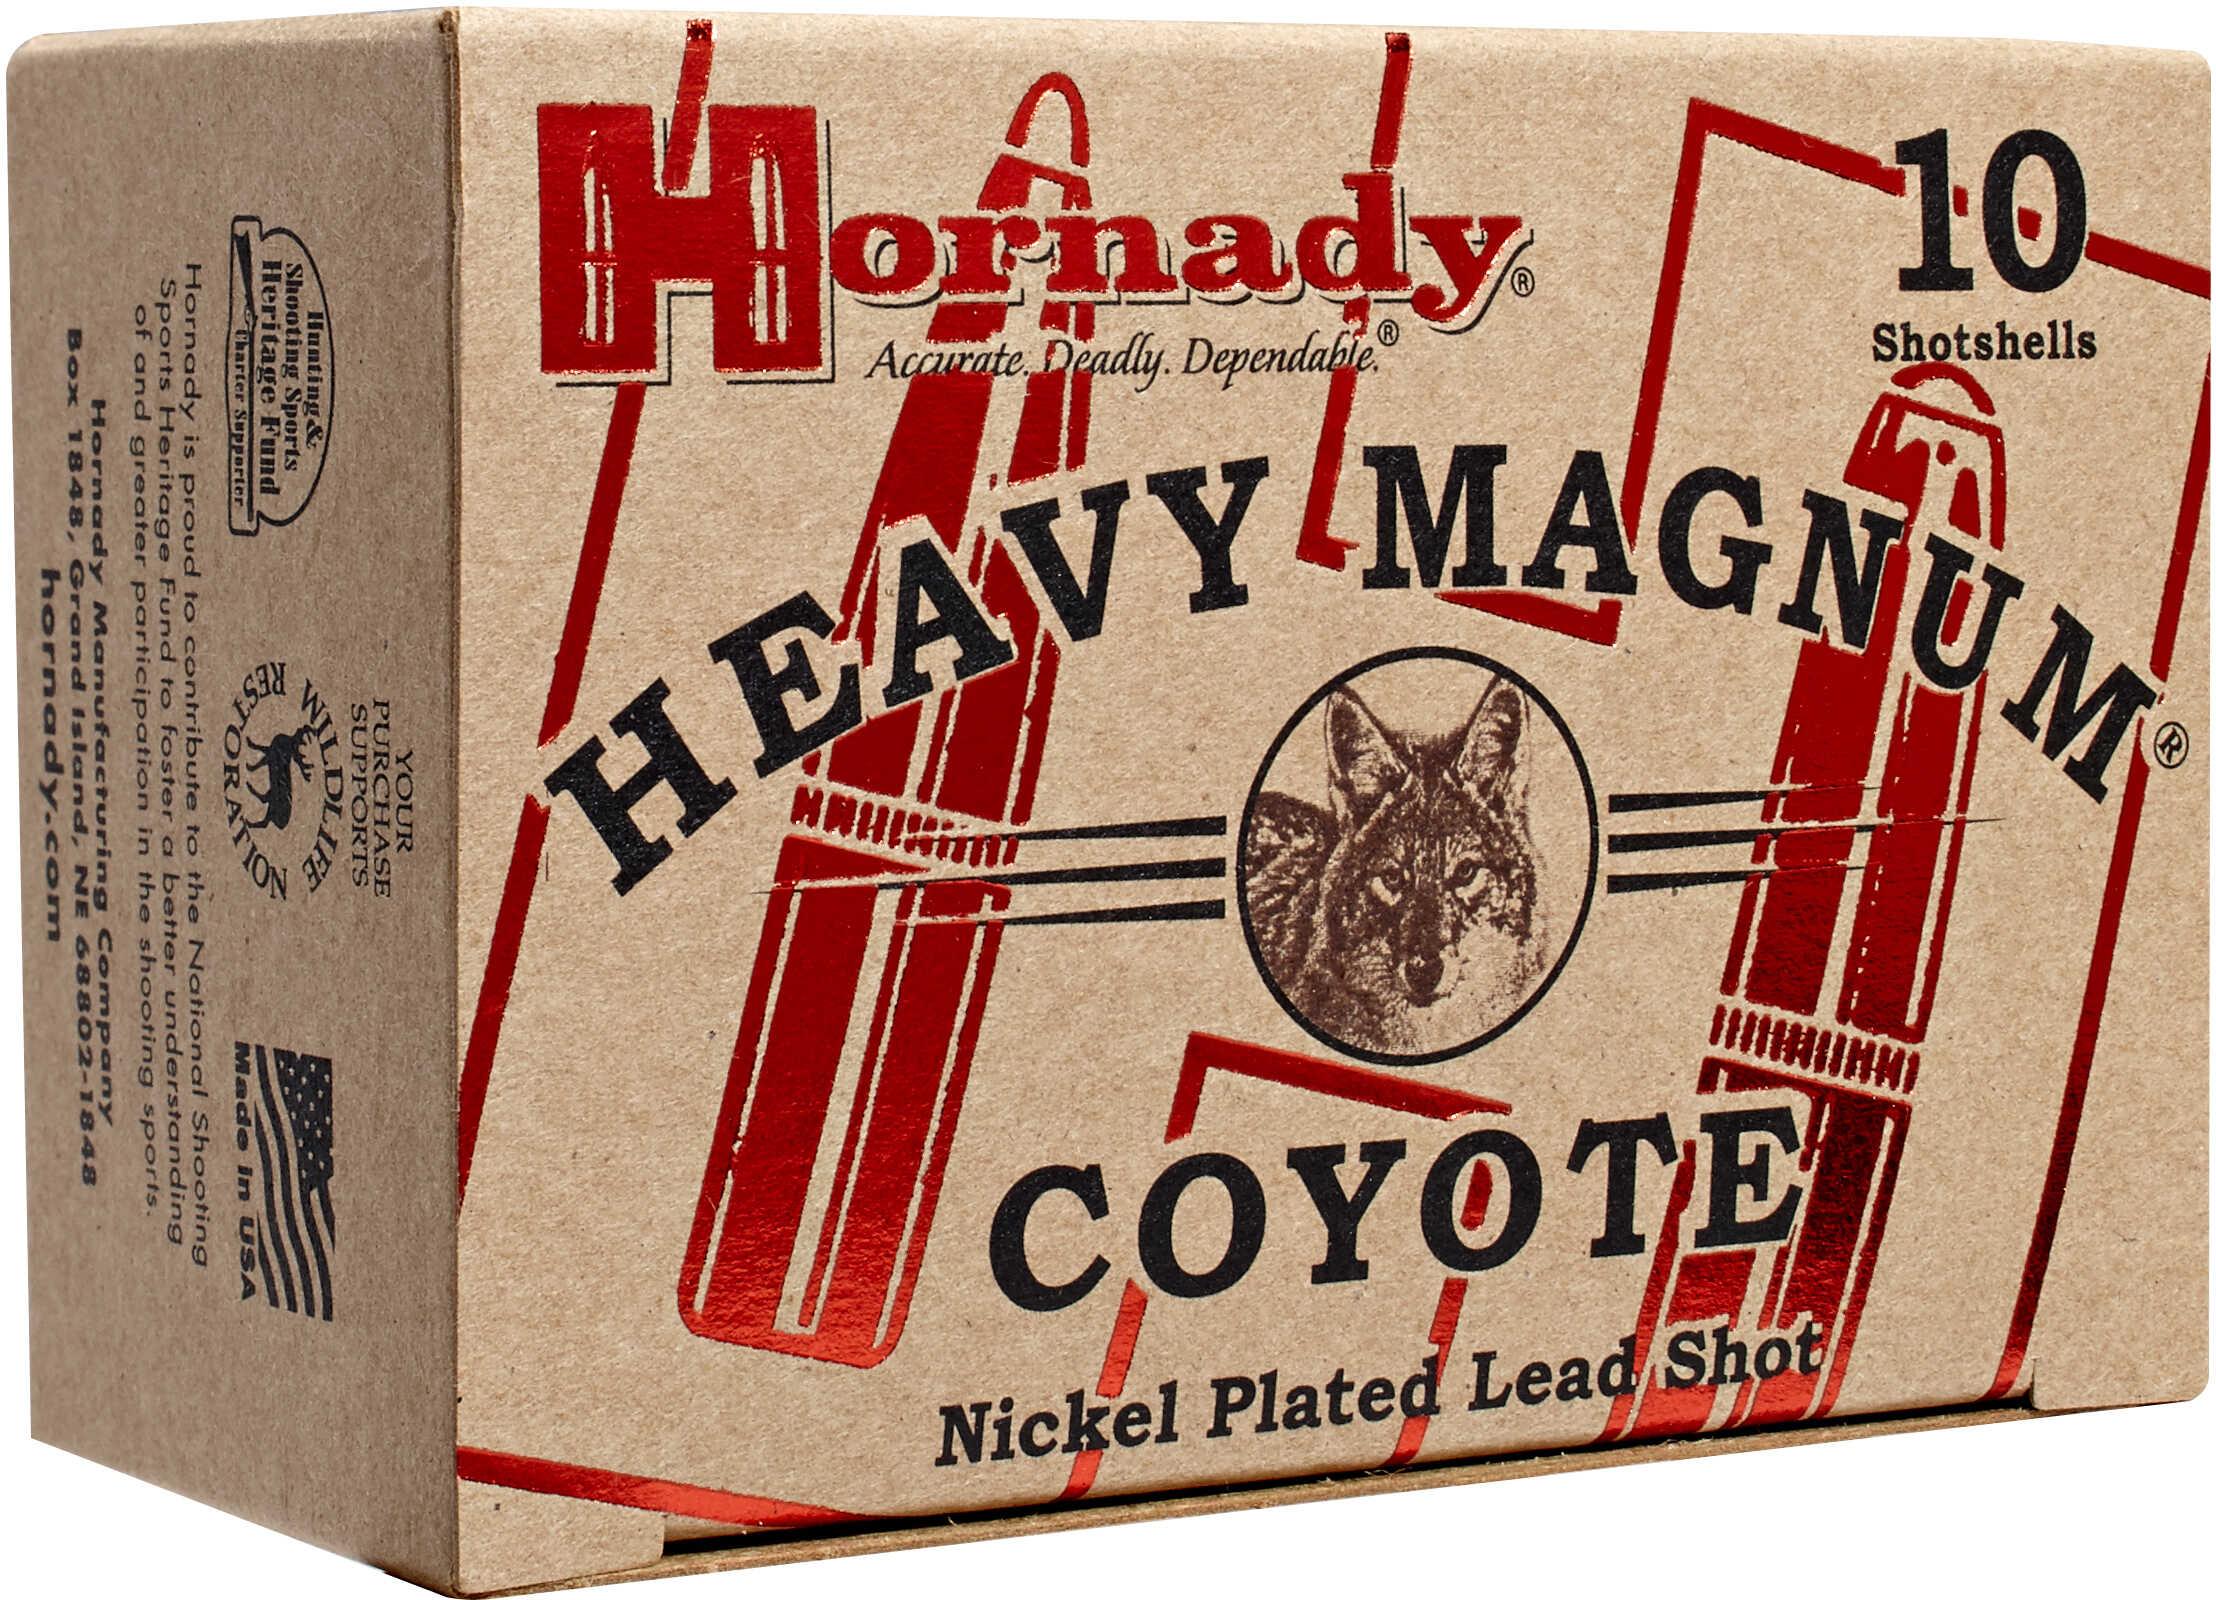 "Hornady Heavy Mag Coyote 12 Gauge 00 Nickel 3"" /10 Md: 86224"